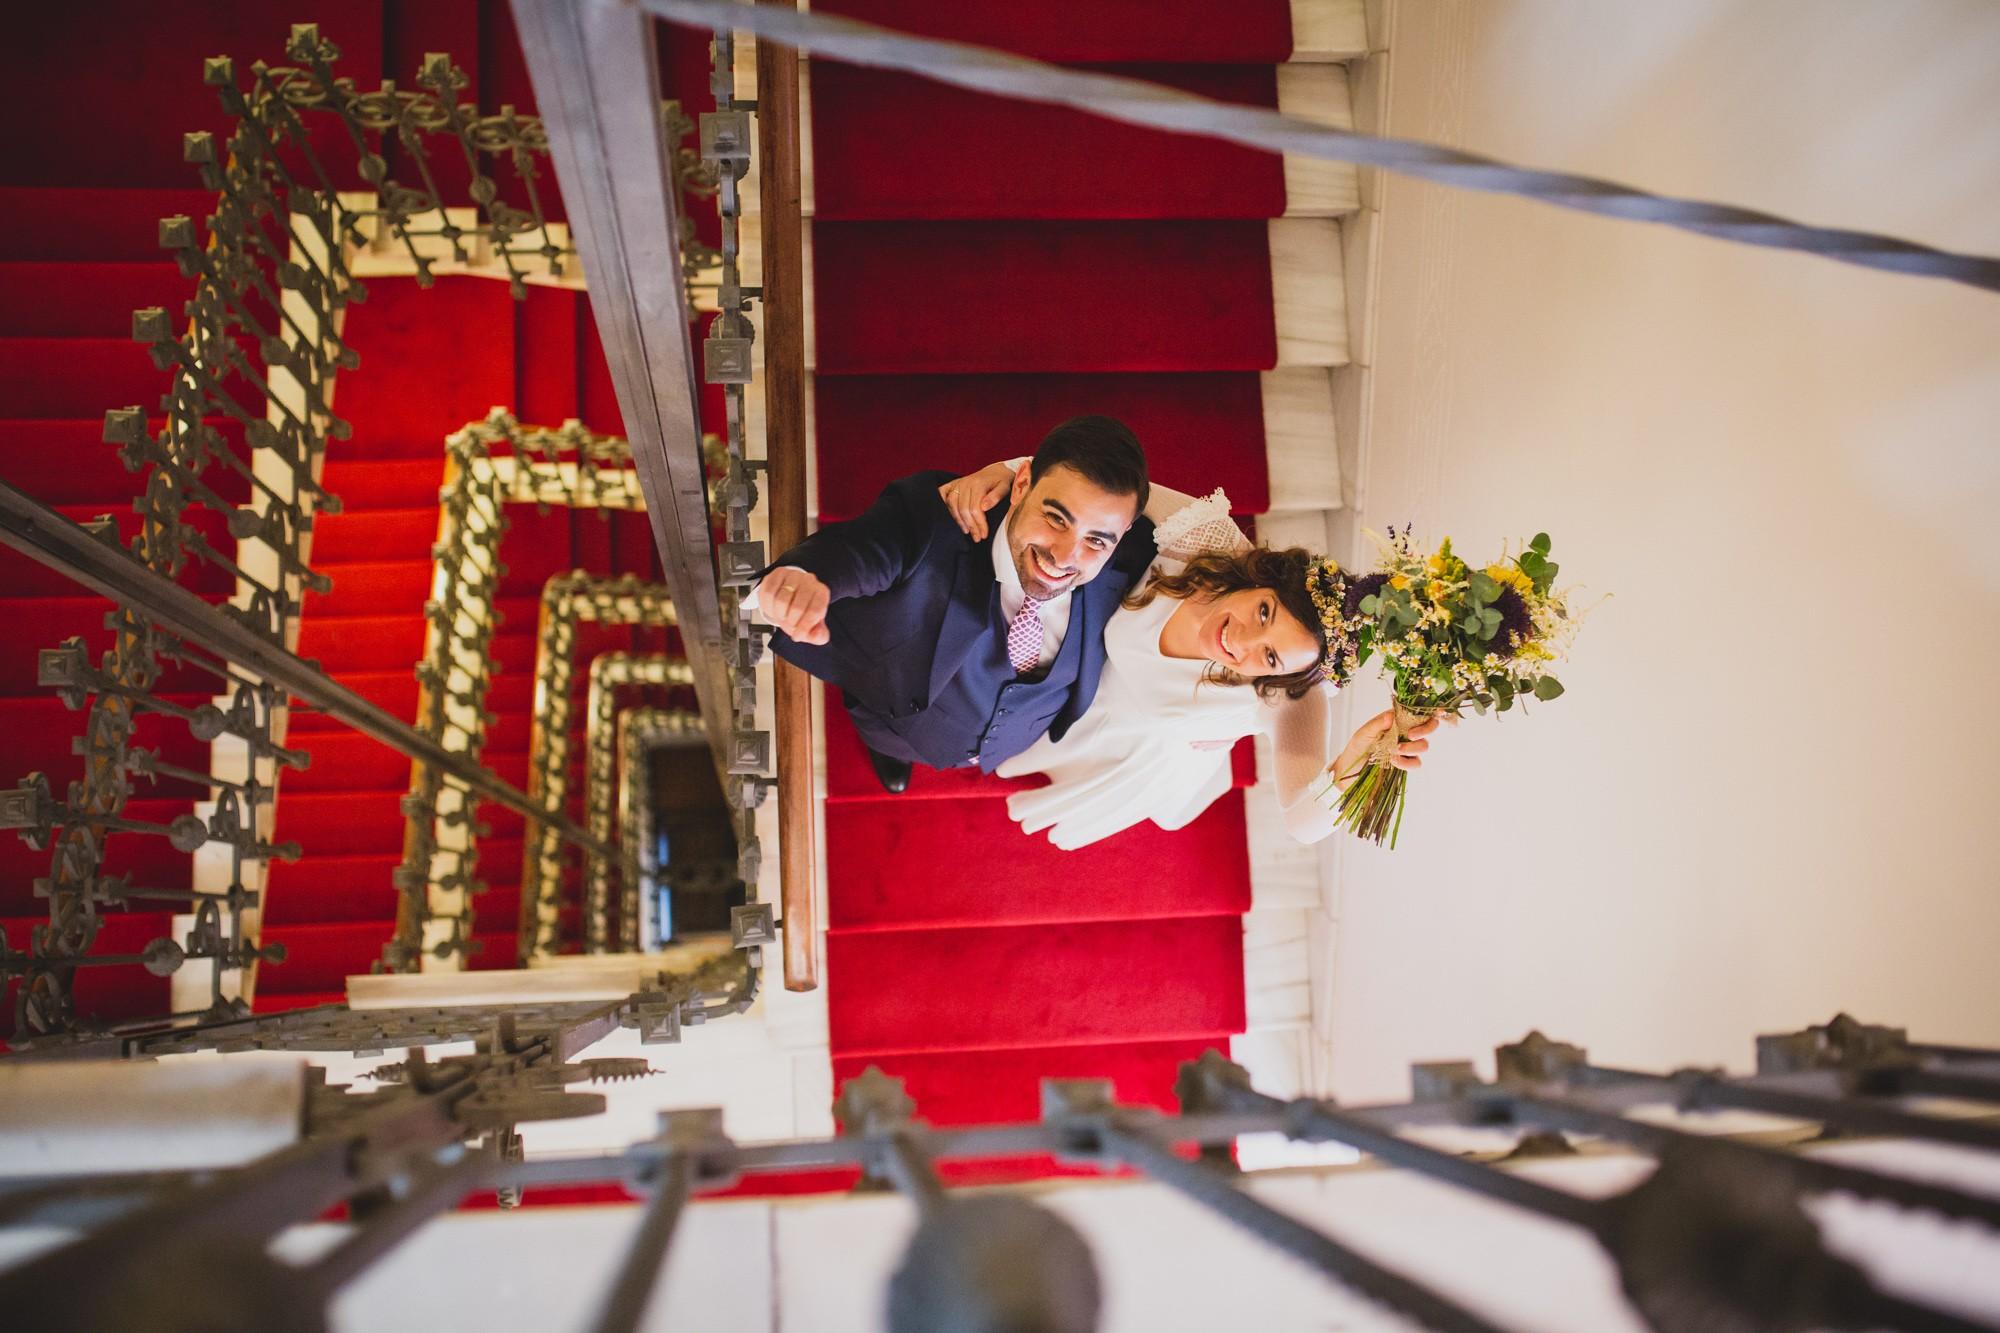 fotografos-boda-Iberostar-Las-Letras-Gran-Via-886224